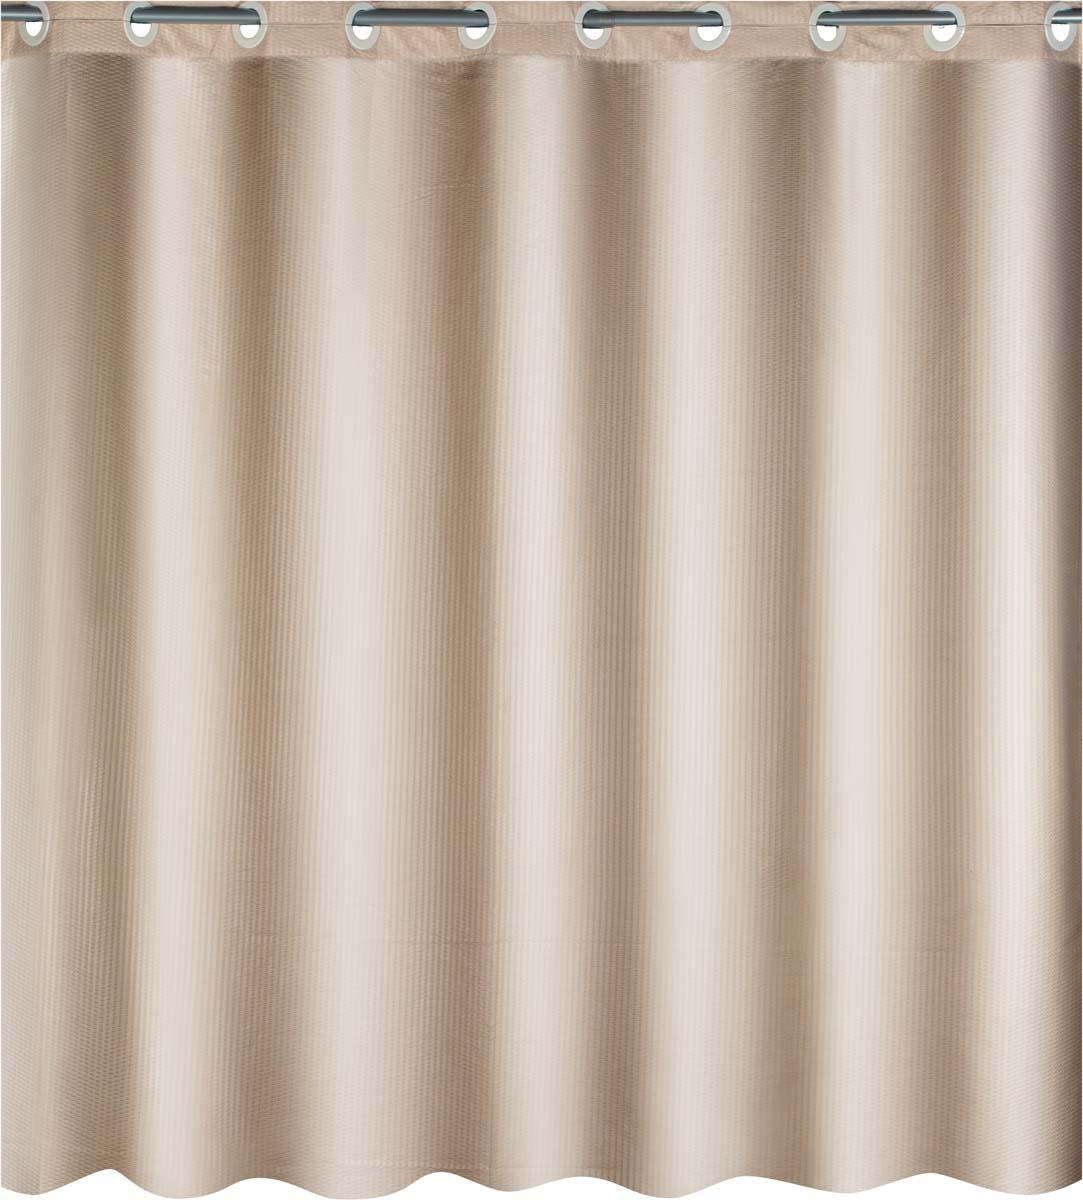 Штора для ванной Swensa Marsala, 180 х 180 см штора для ванной swensa анкона цвет бежевый 180 х 180 см